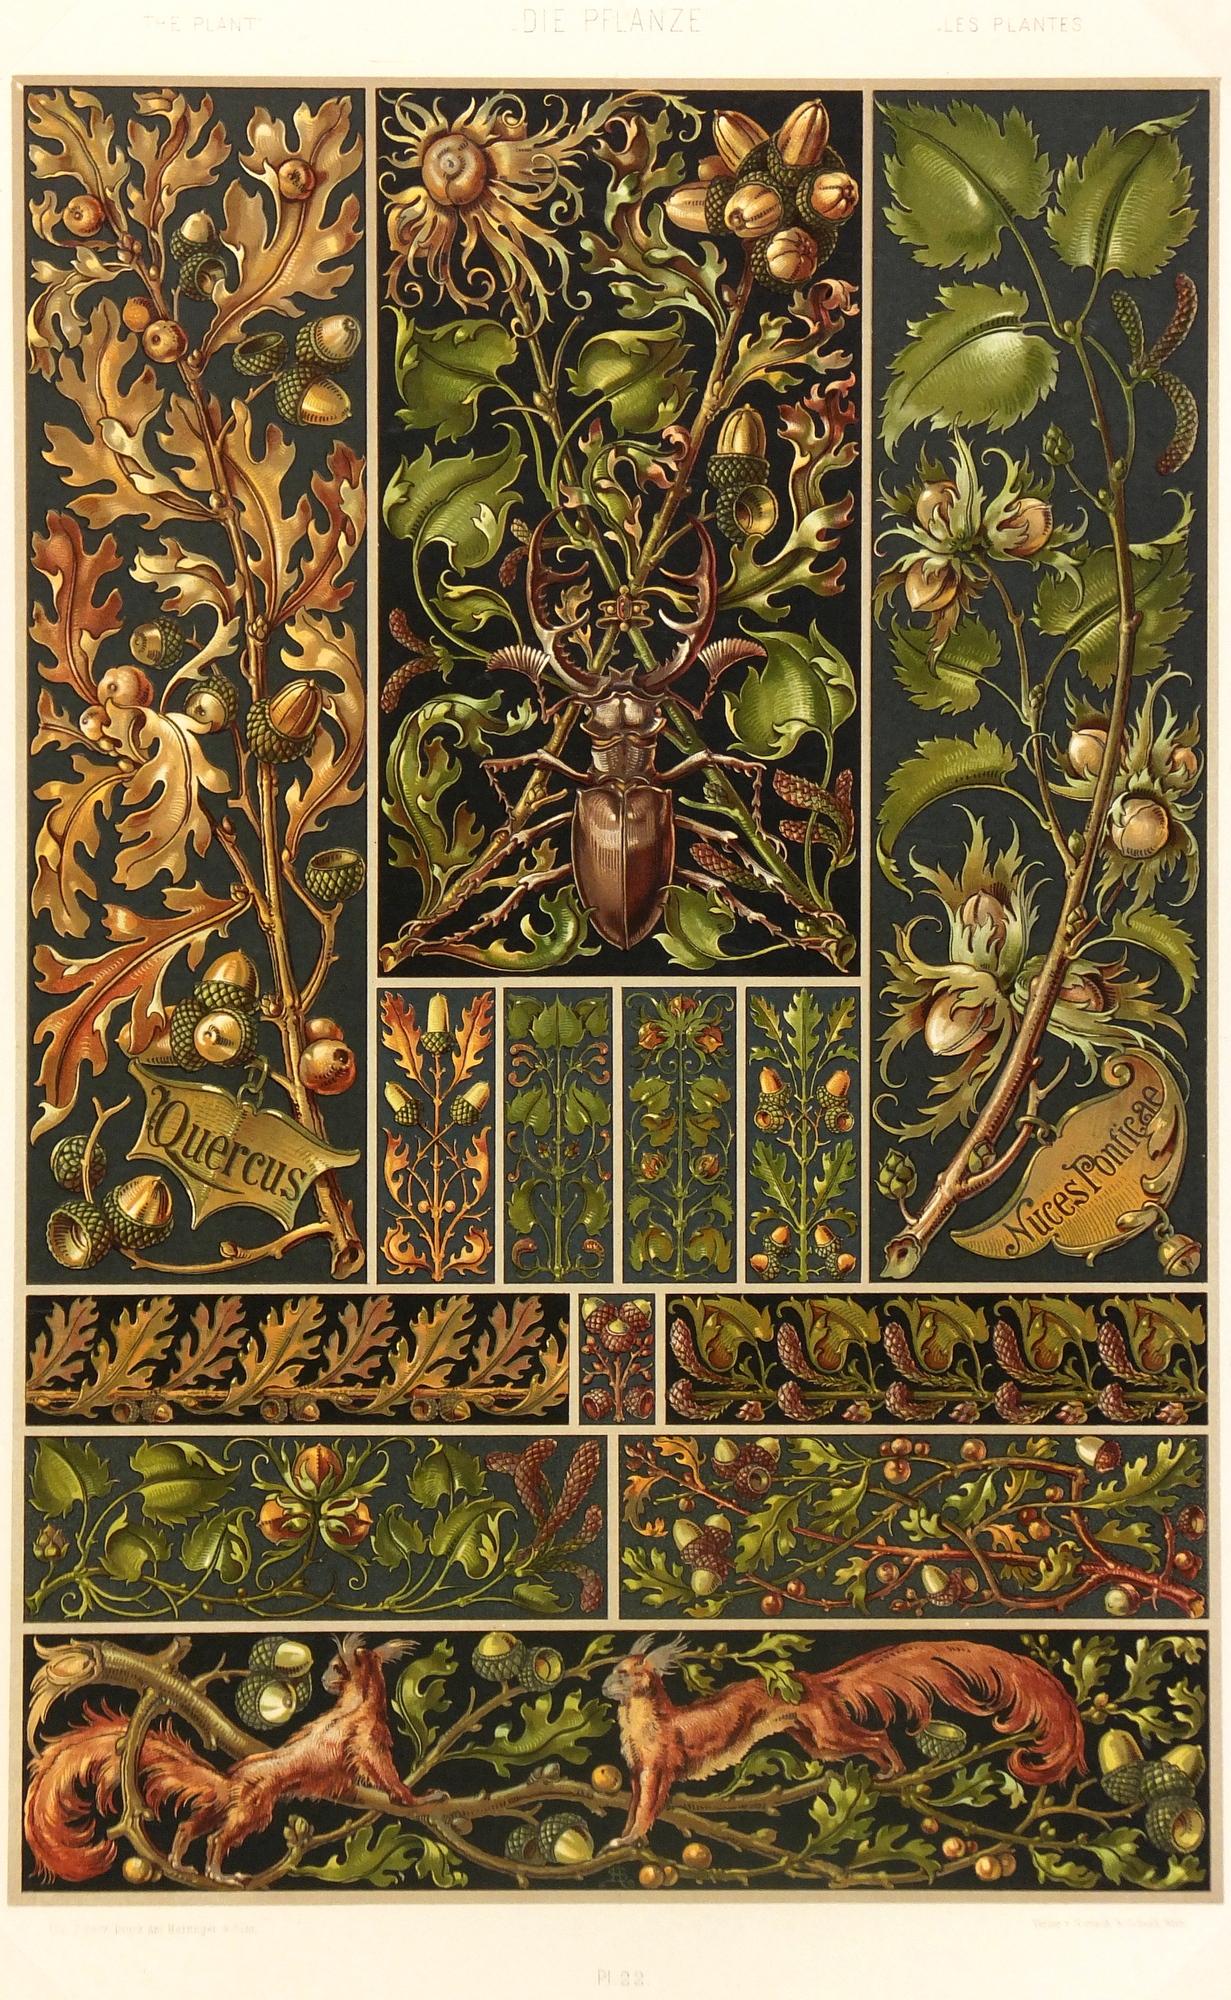 Lithograph - Nature's Interiors, 1886-main-5629K